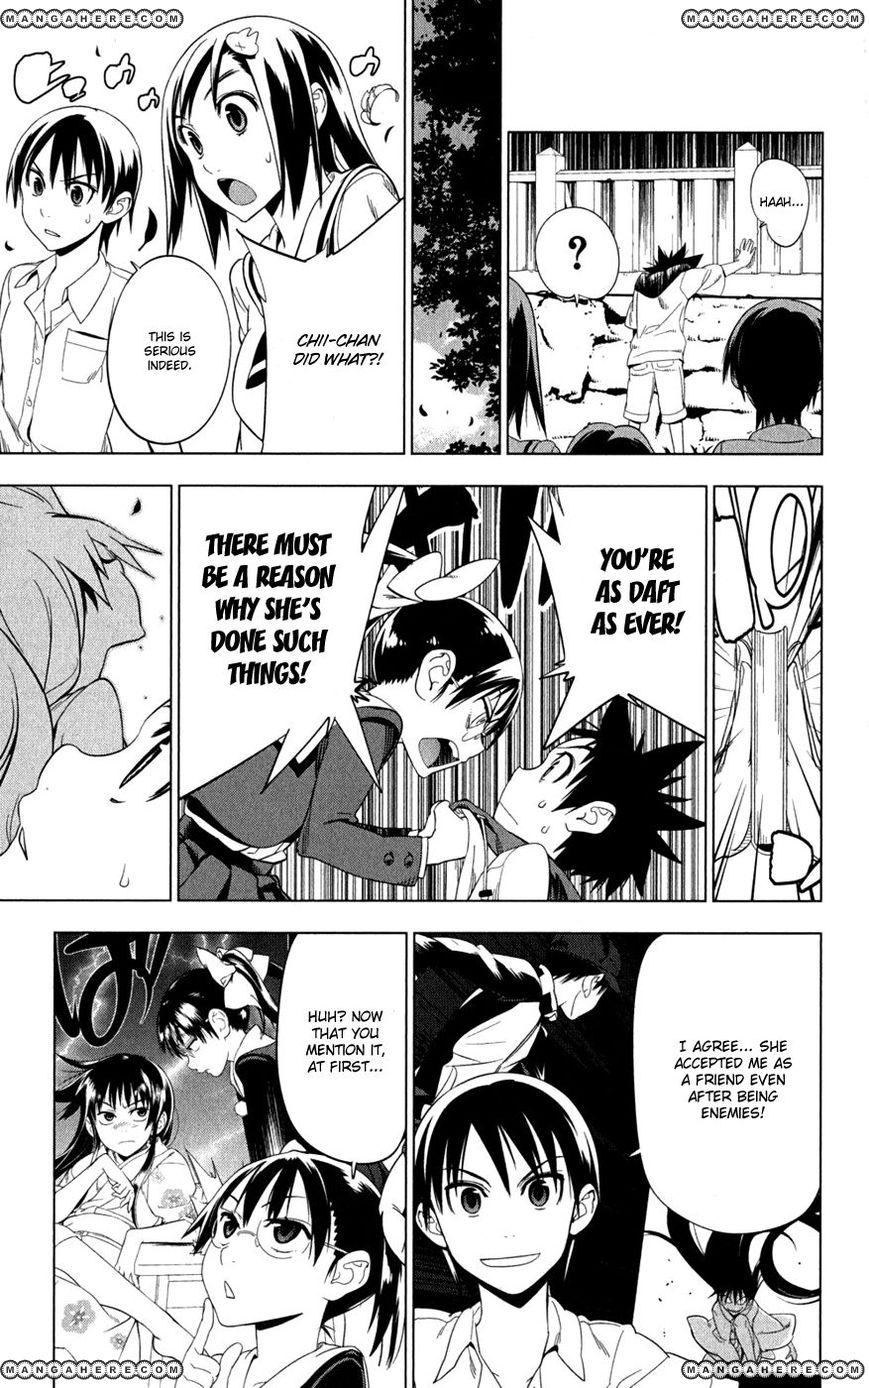 Onikirisama no Hakoirimusume 21 Page 3